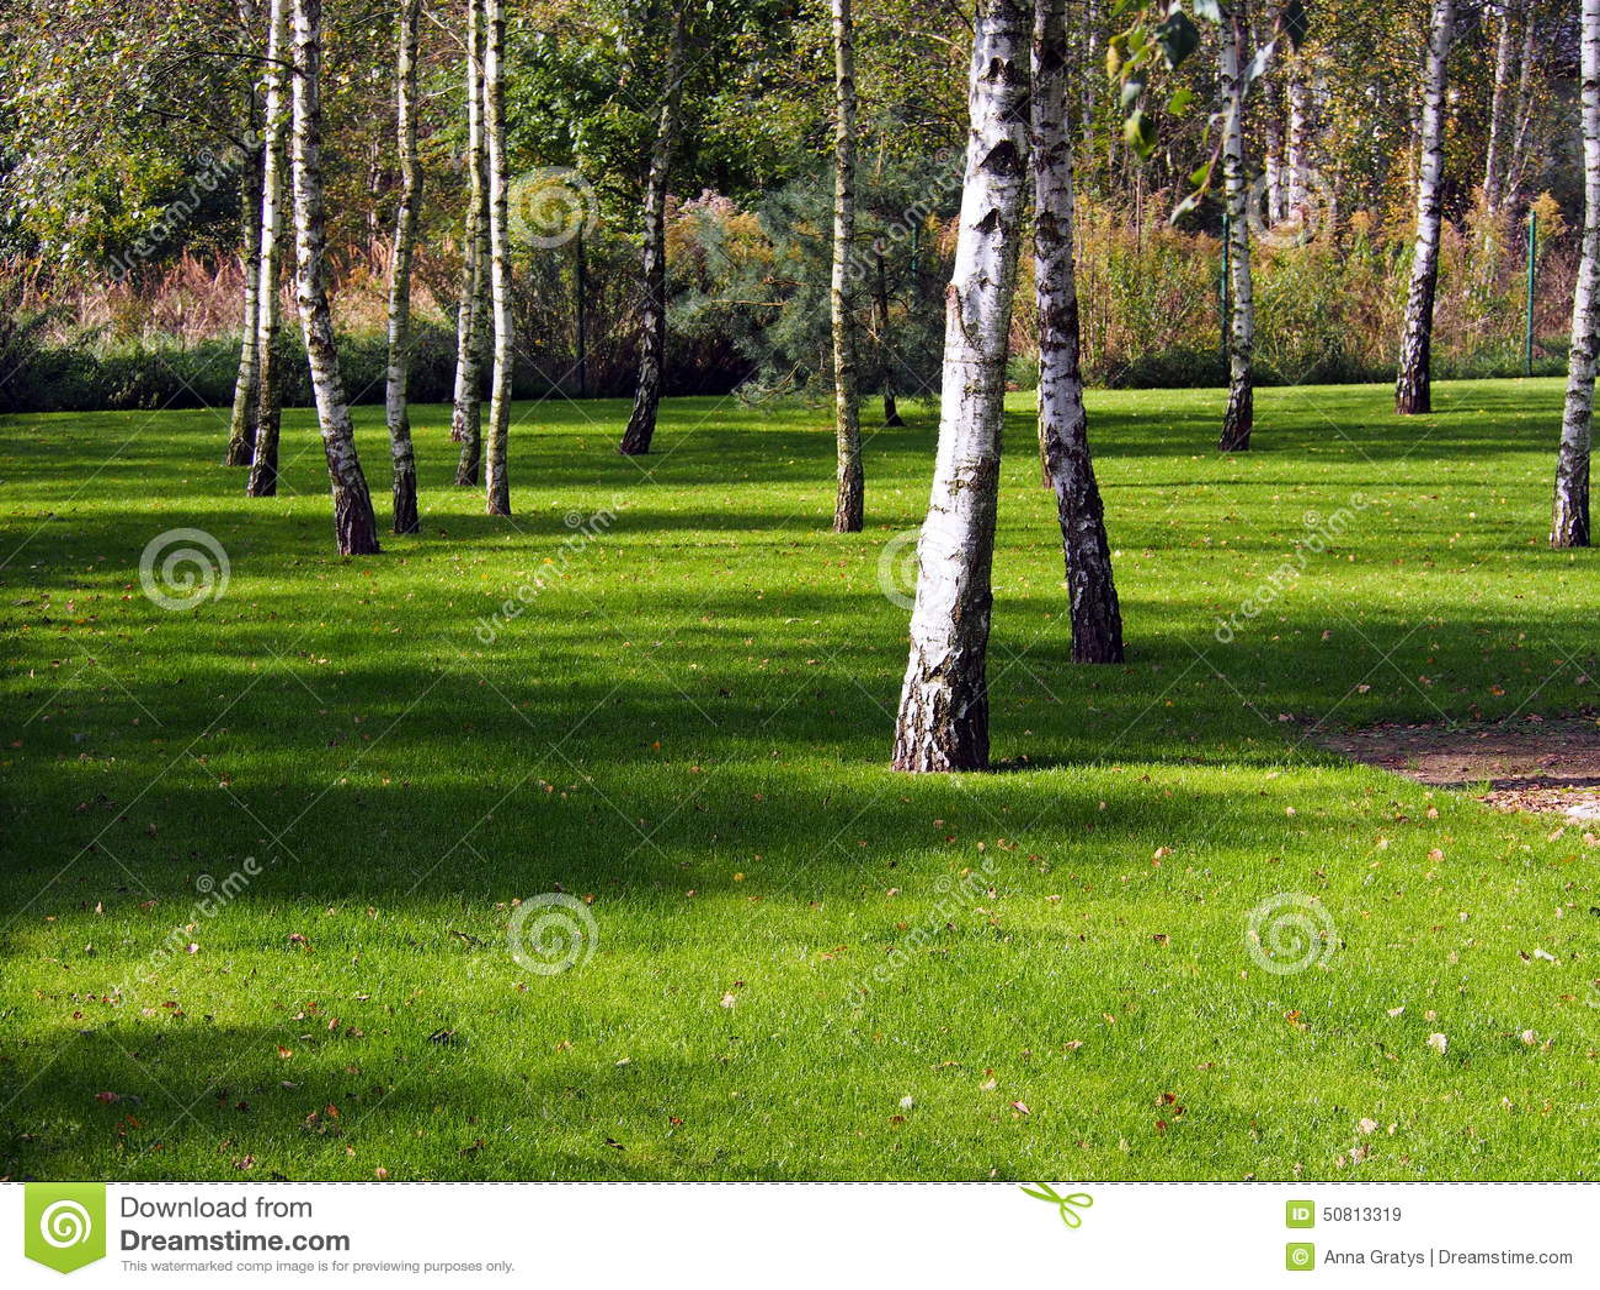 Alberi di betulla sul prato inglese nel giardino immagine - Giardino in inglese ...